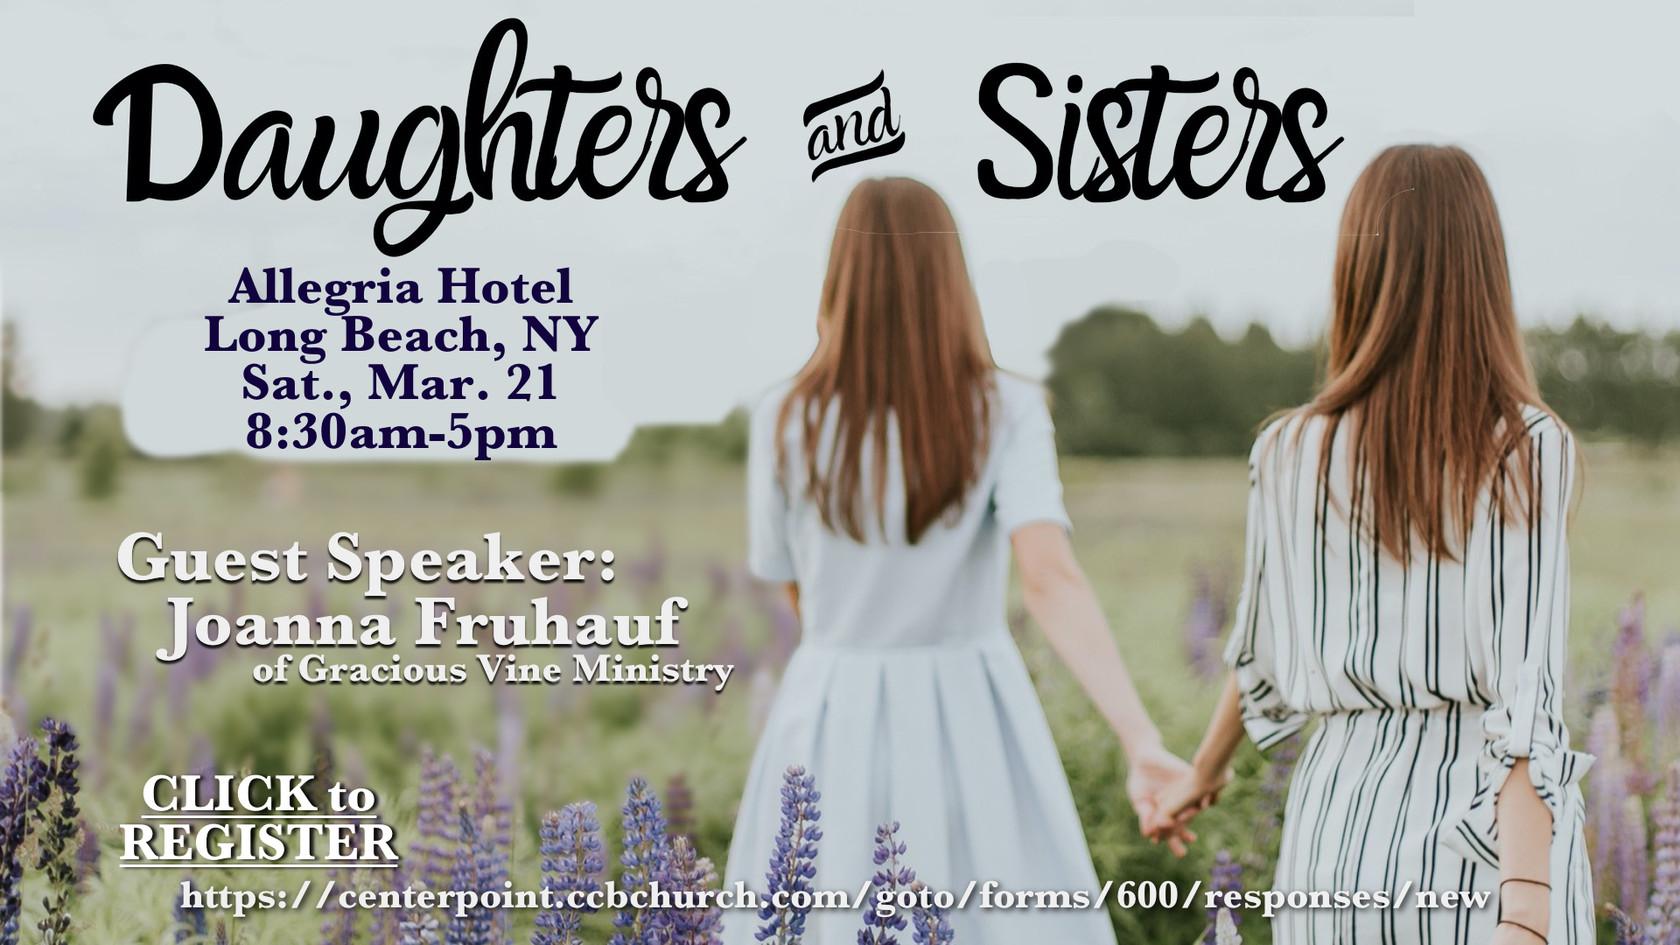 centerpoint daughters flyer 2020.jpg